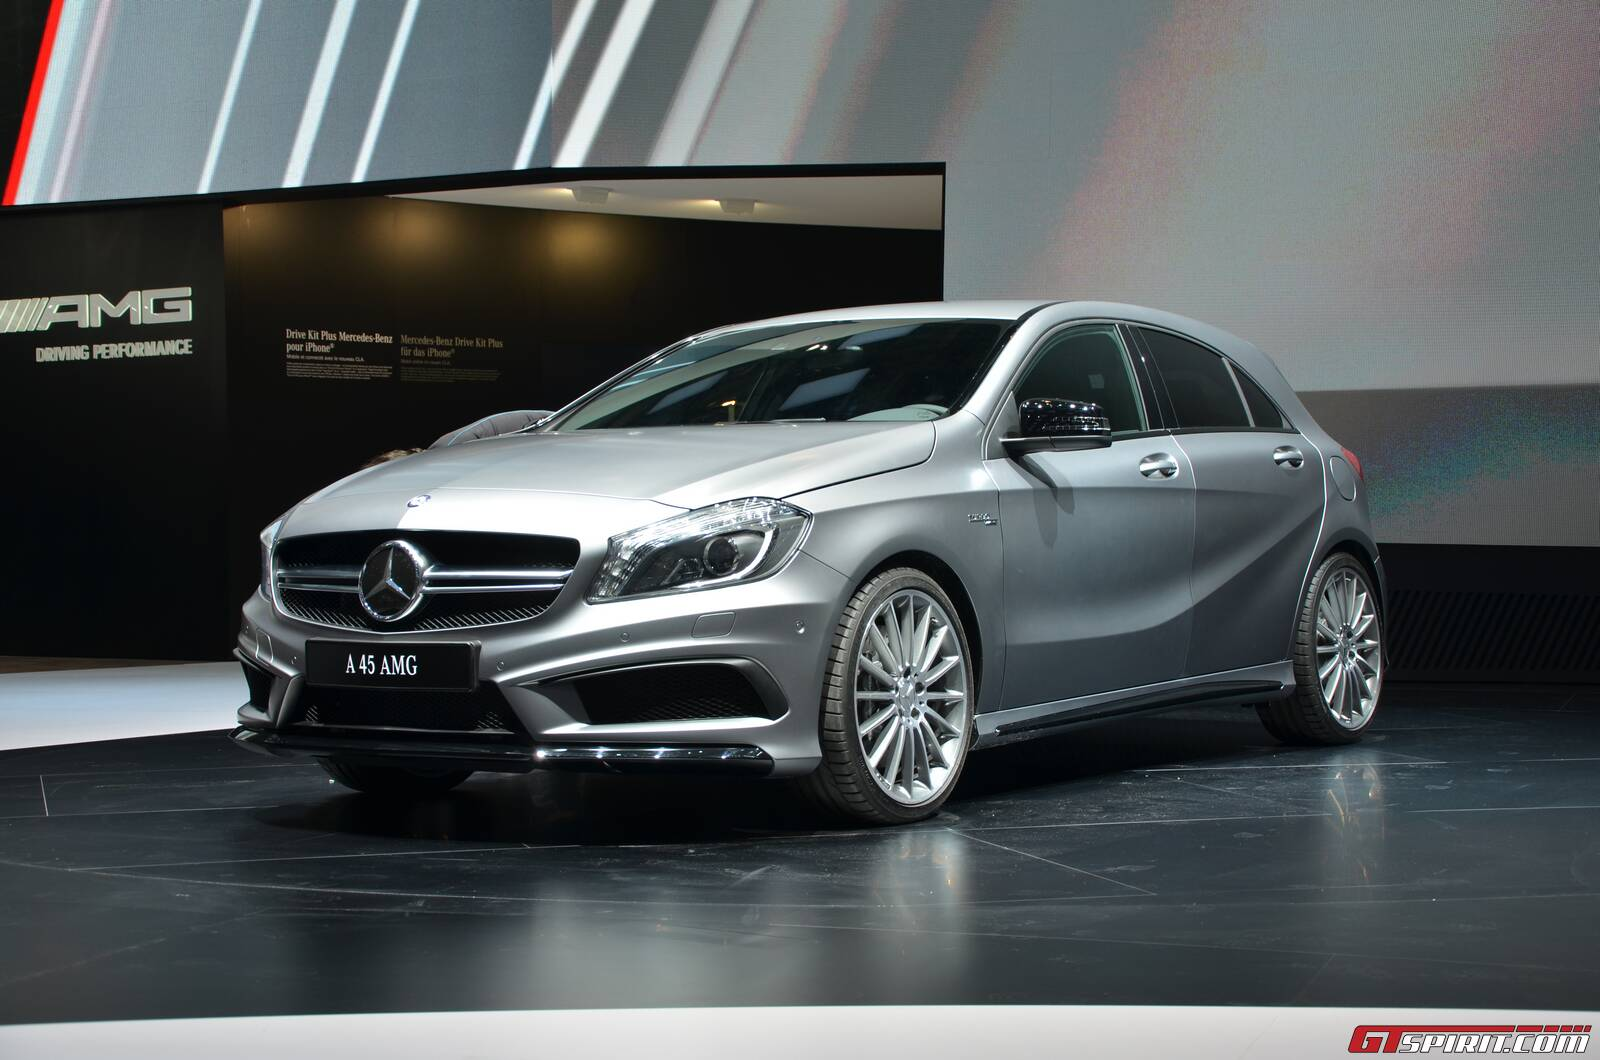 Geneva 2013: Mercedes-Benz A 45 AMG - GTspirit